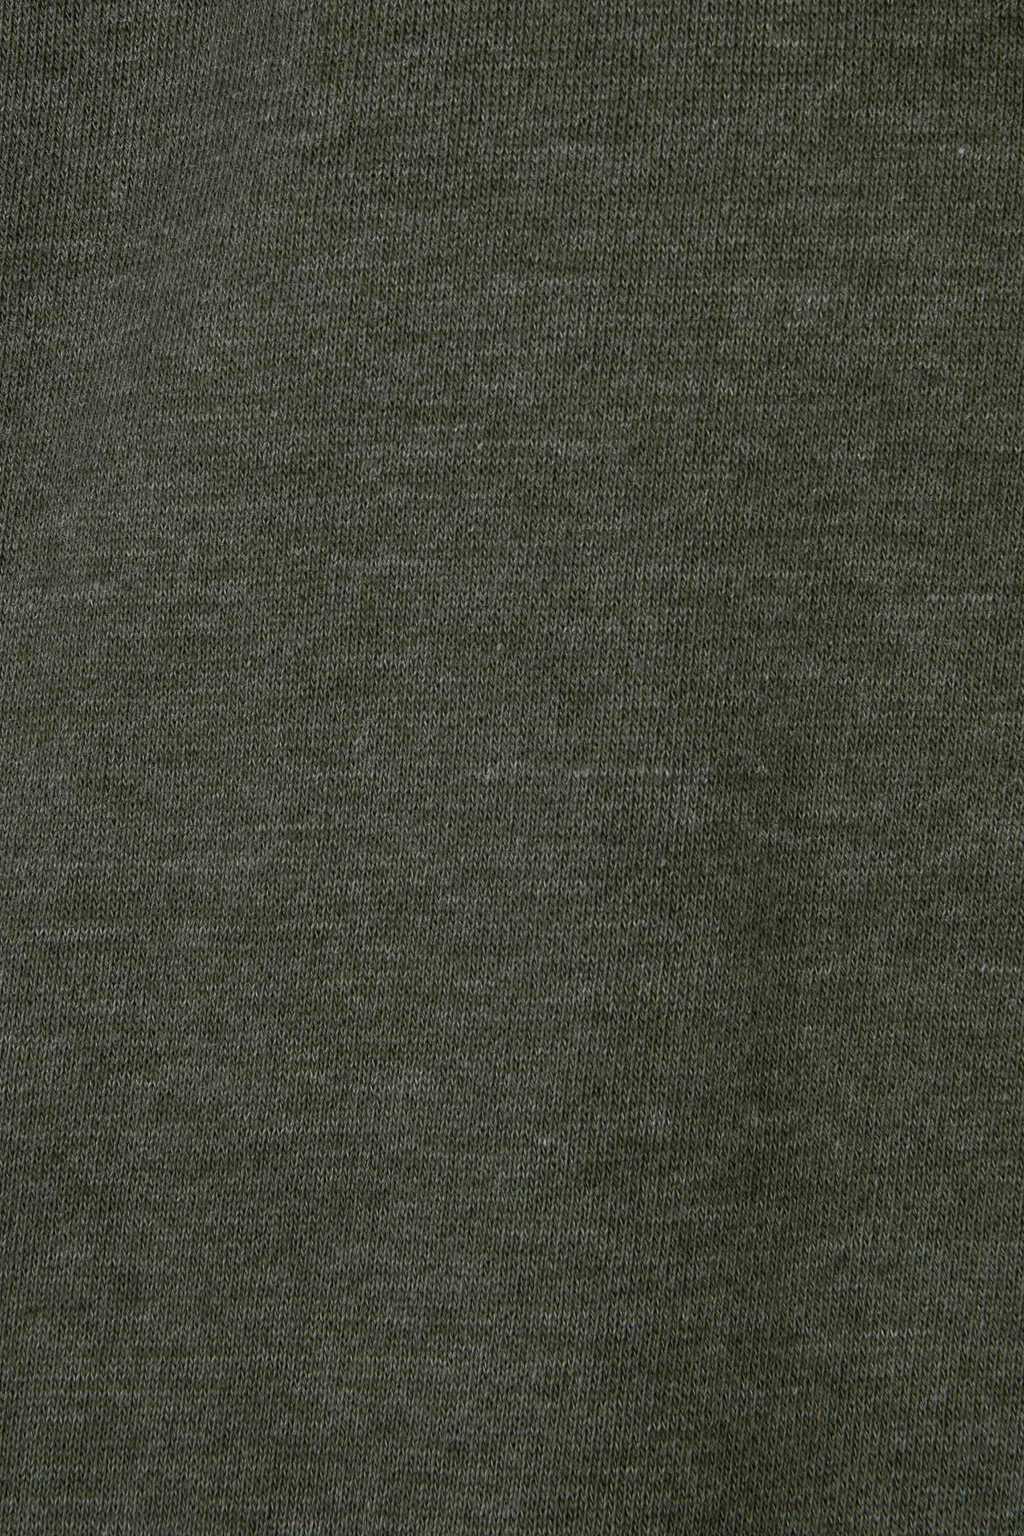 Pant 3316 Olive 12